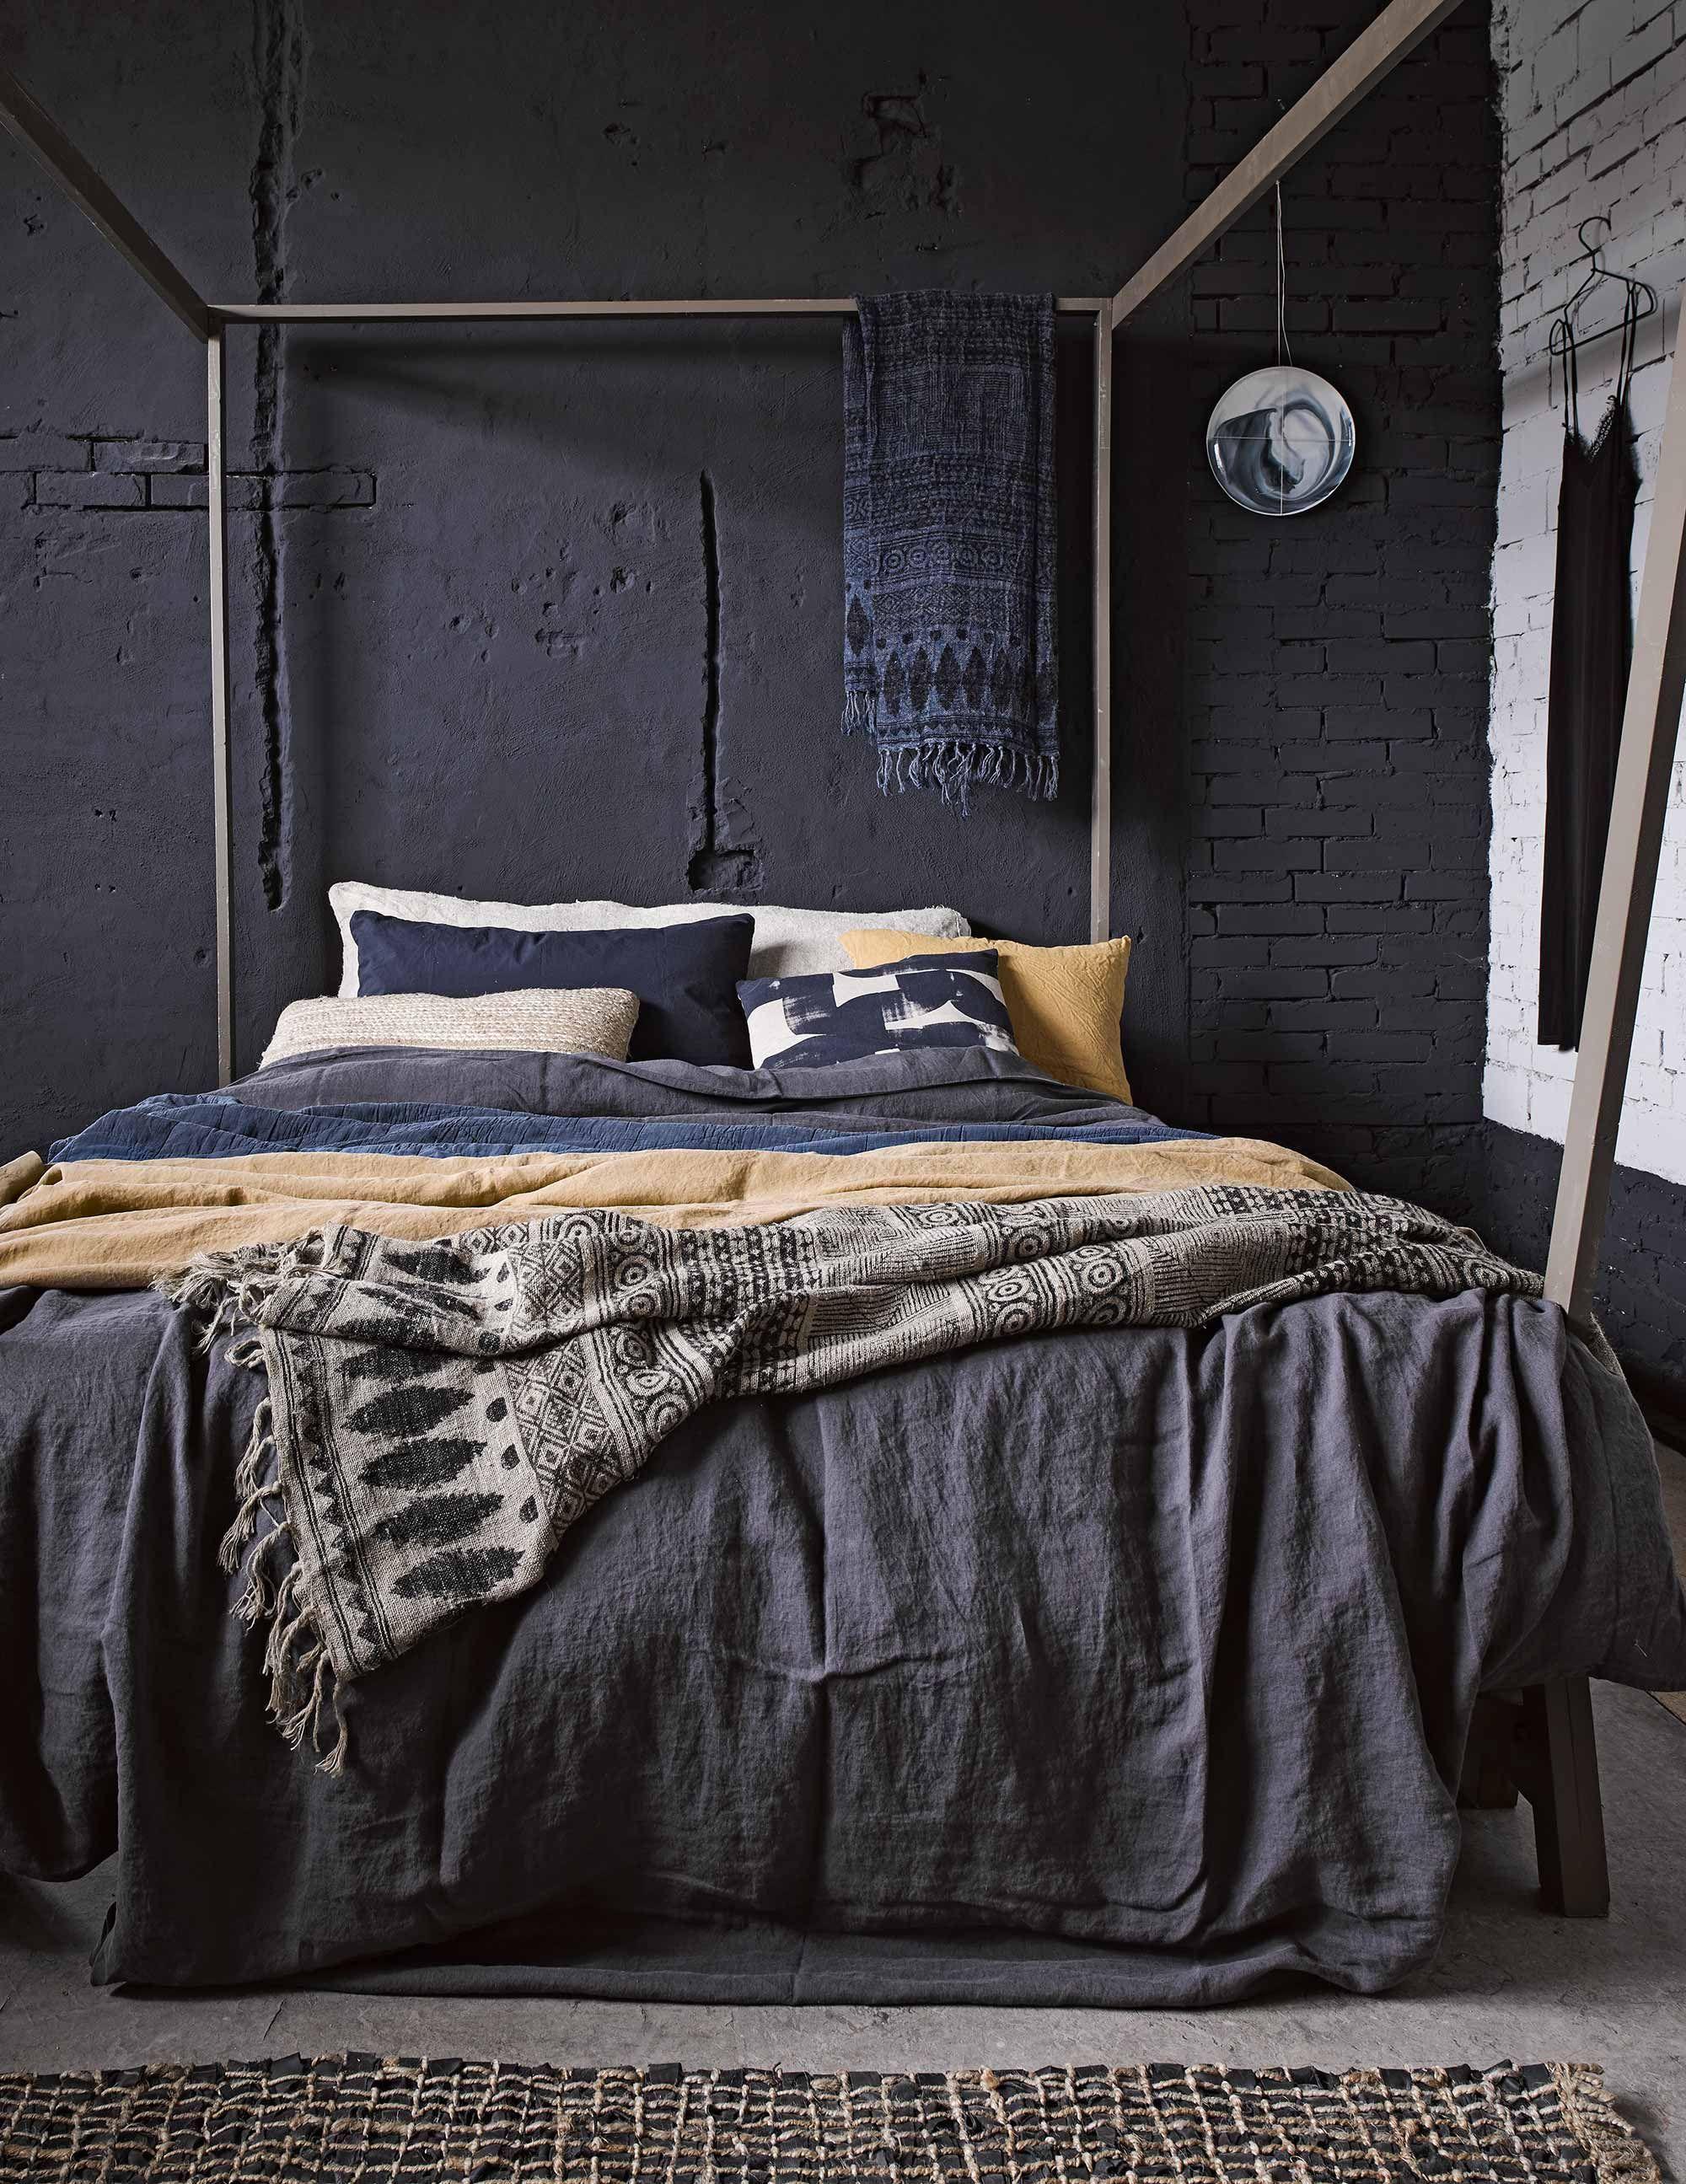 donkere slaapkamer dark sleepingroom vtwonen 03 2017 fotografie alexander van berge hans blomquist debi treloar styling marianne luning